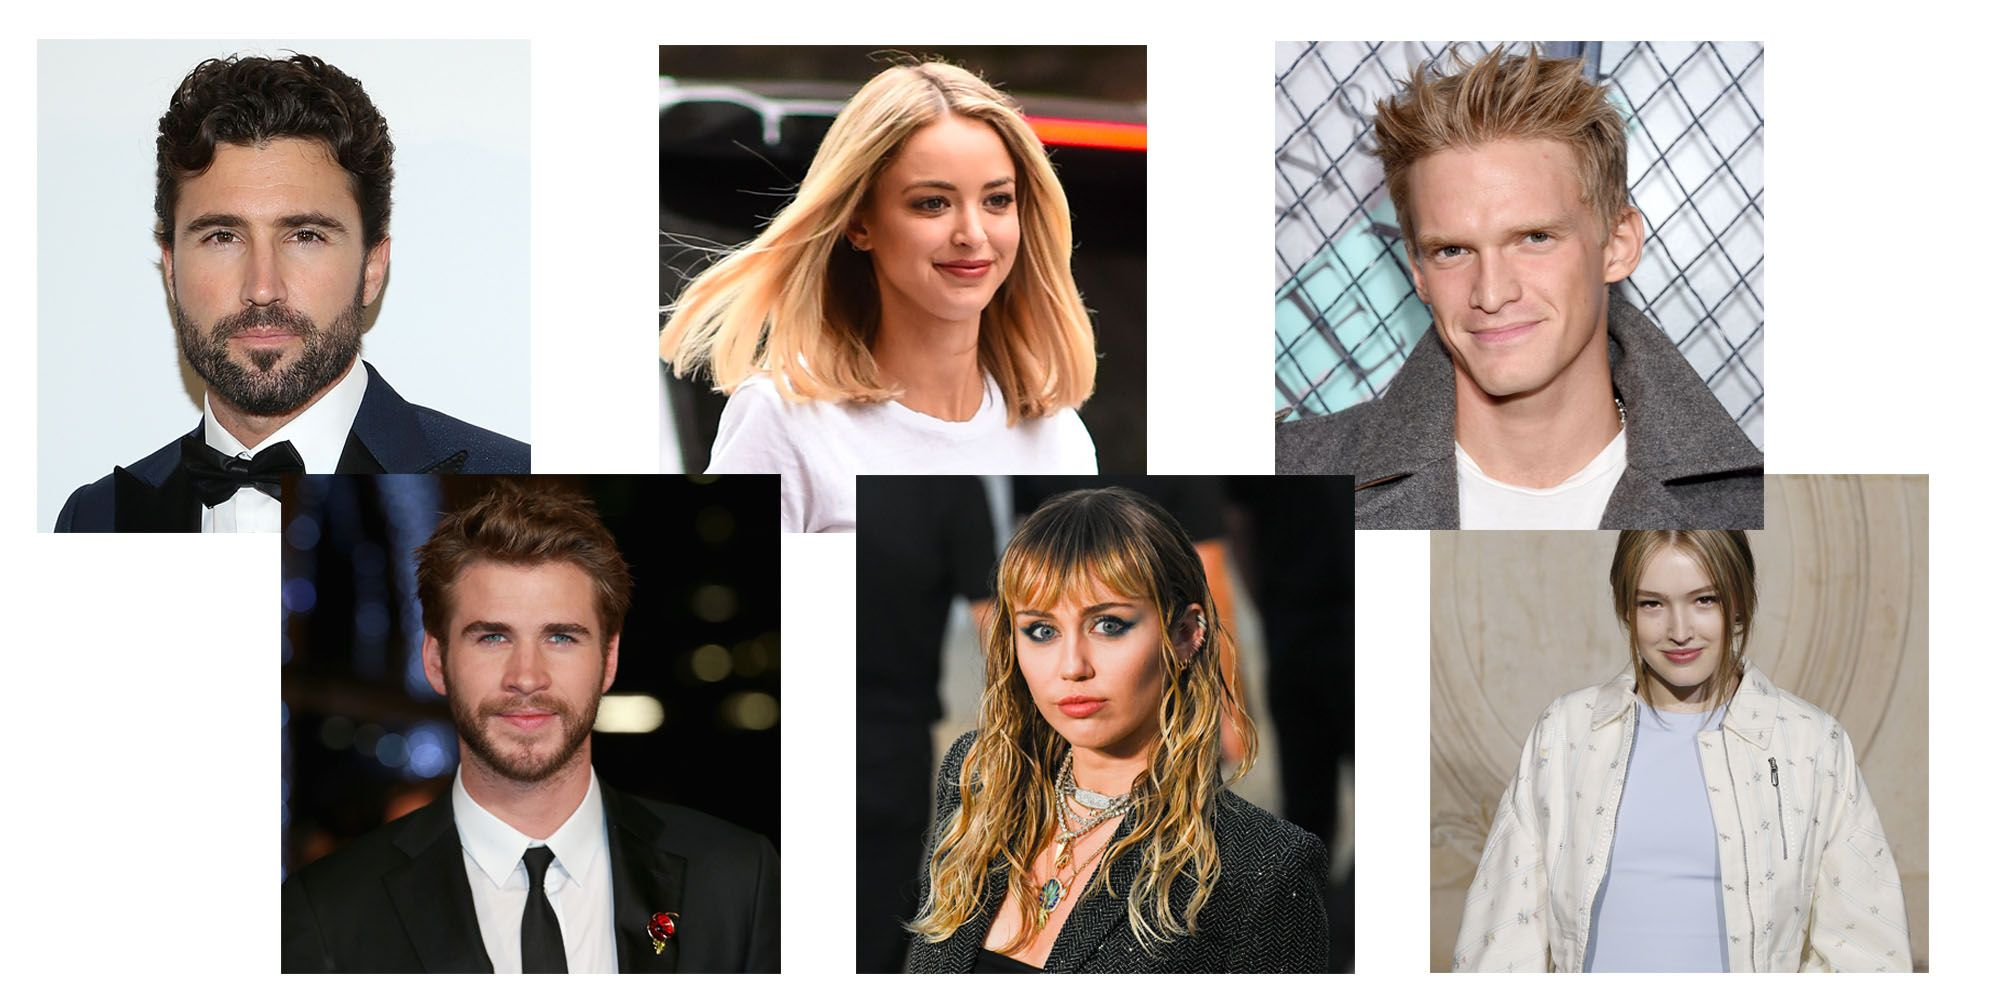 Miley Cyrus Has Unfollowed Both Liam Hemsworth and Kaitlynn Carter on Instagram